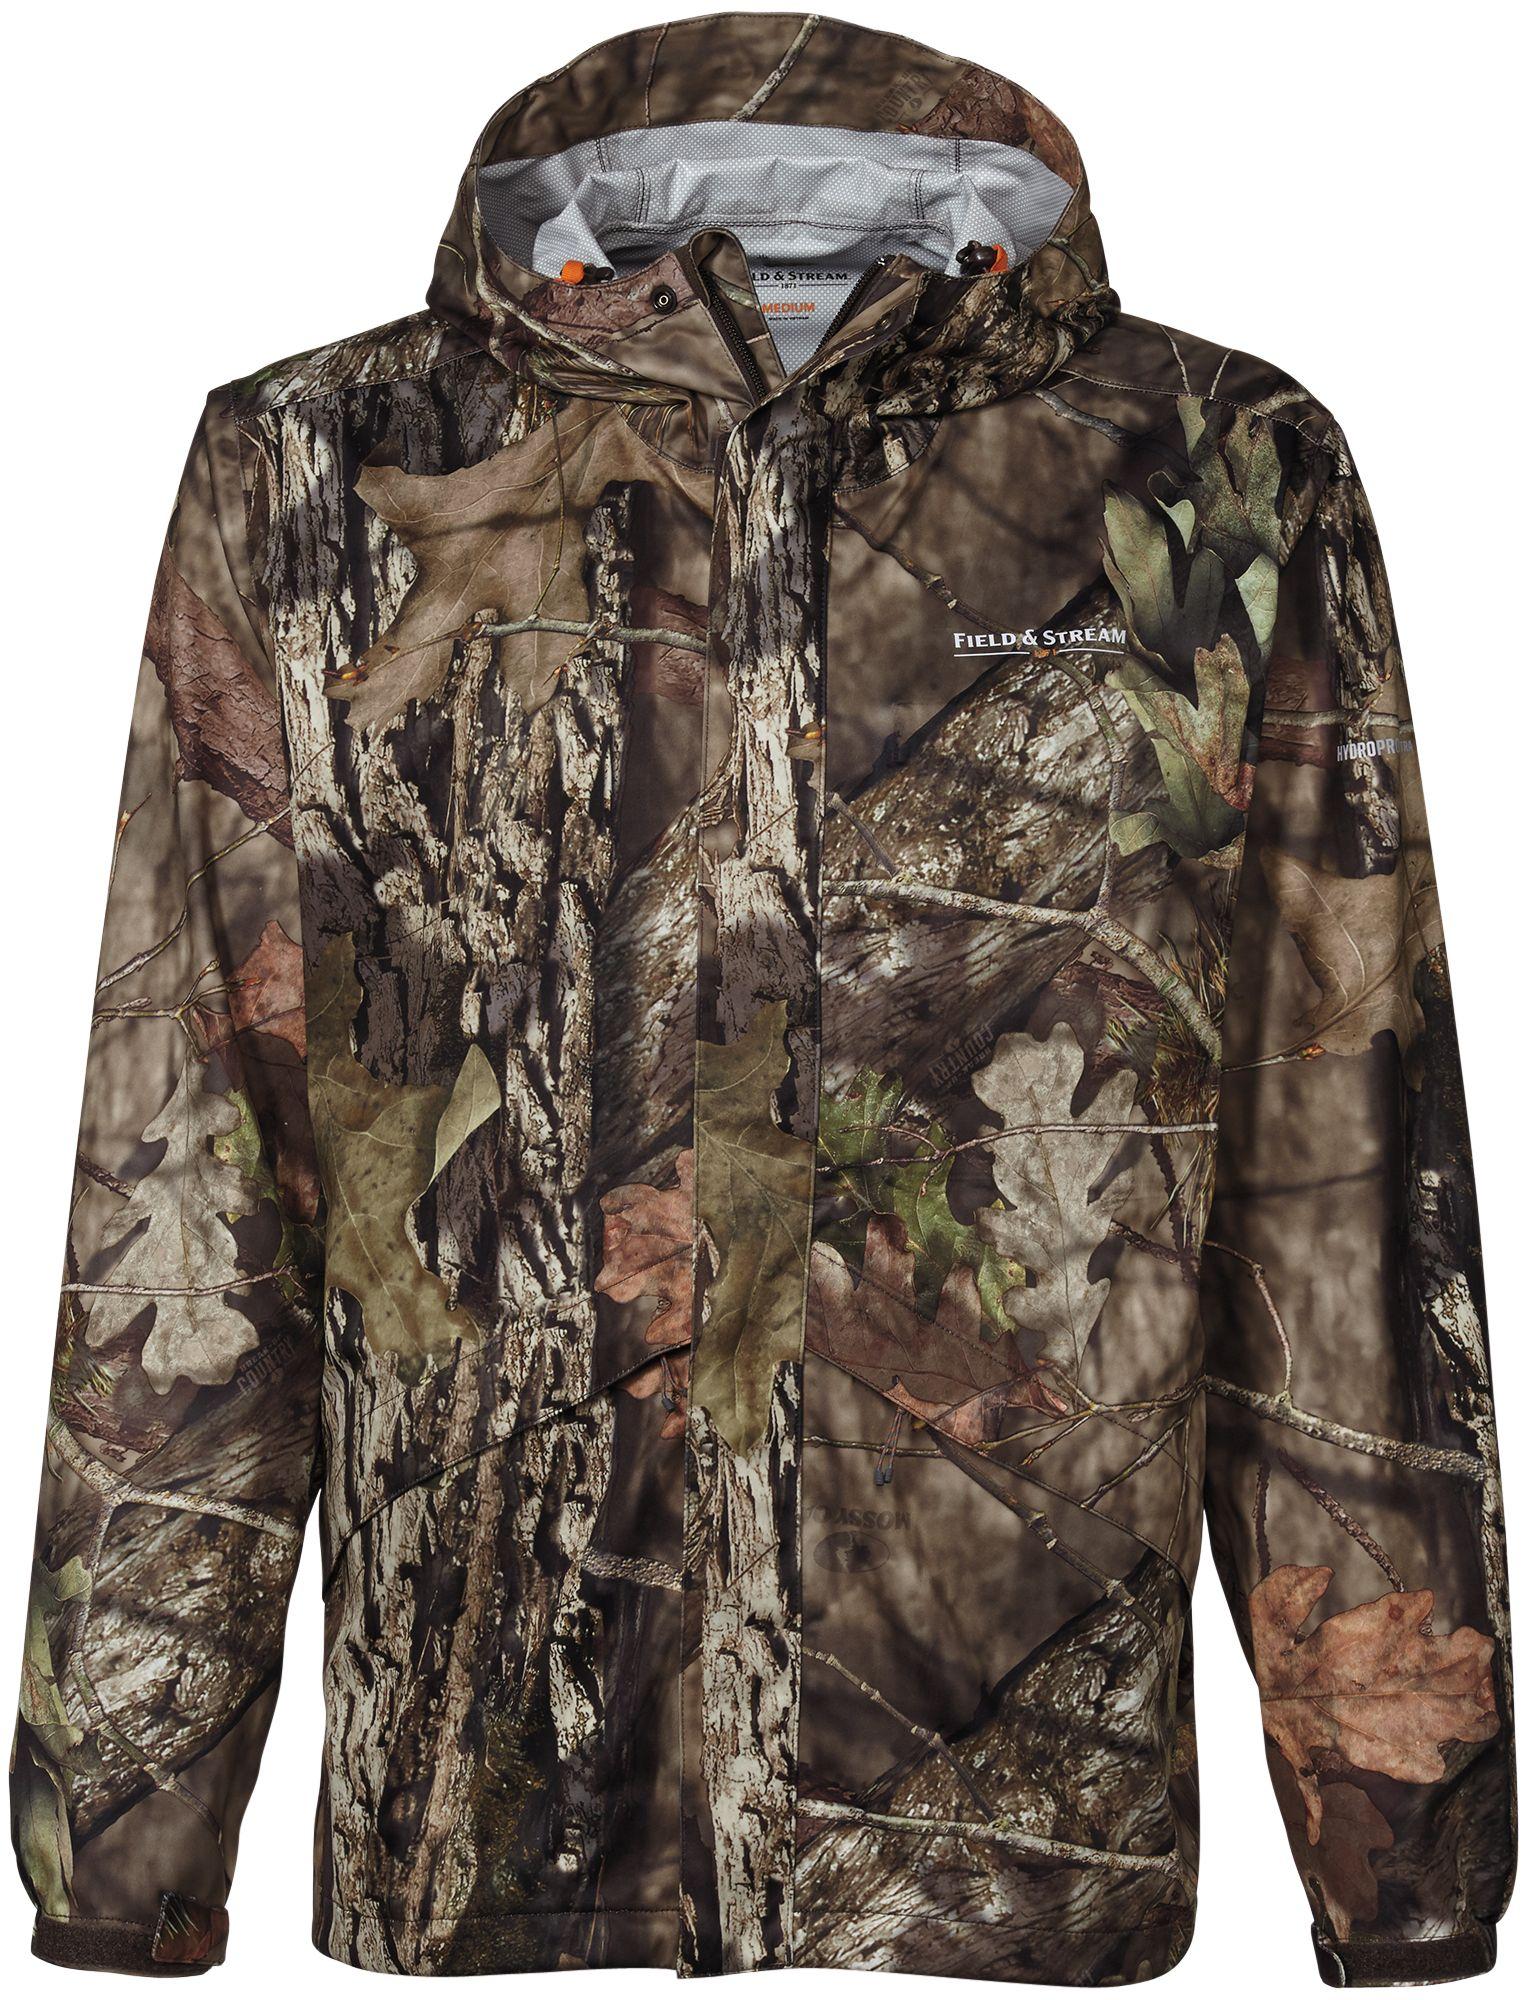 Field & Stream Lightweight Packable Rain Hunting Jacket, Men's, Size: Medium, Mossy Oak Brk-Up Country thumbnail